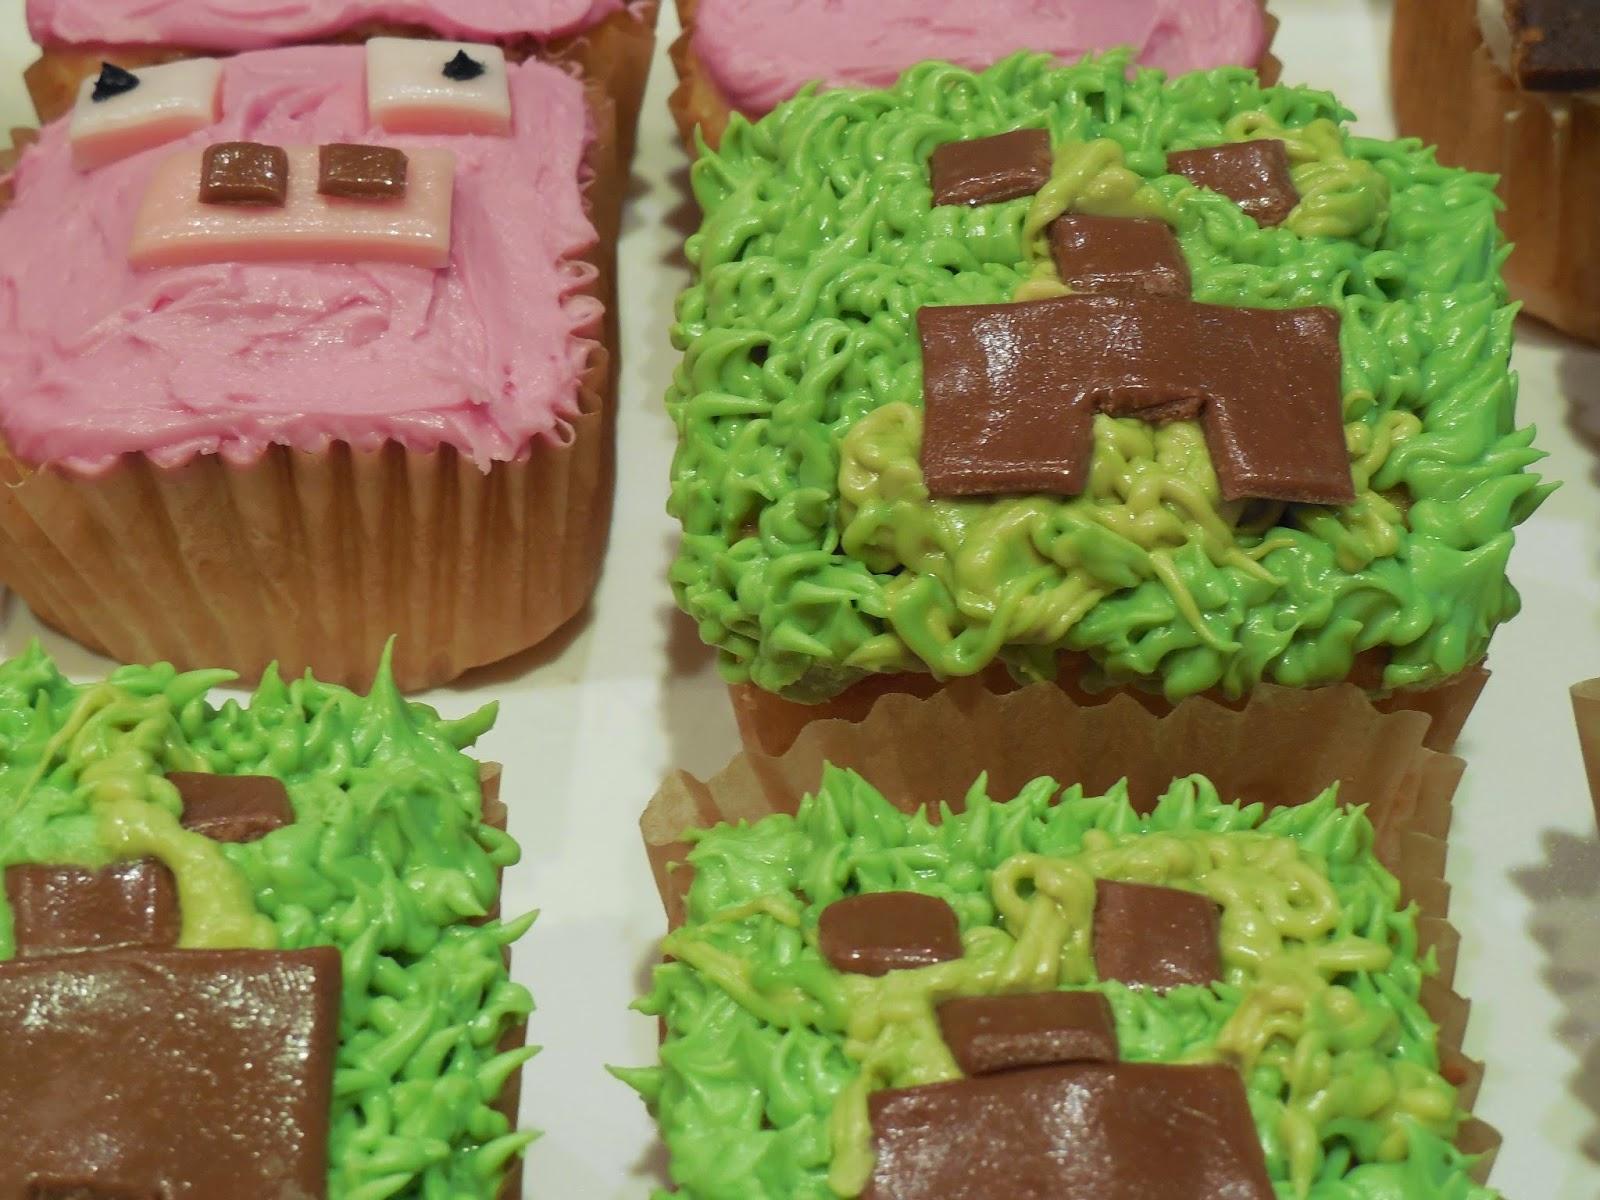 Woof Nanny Minecraft Cupcakes